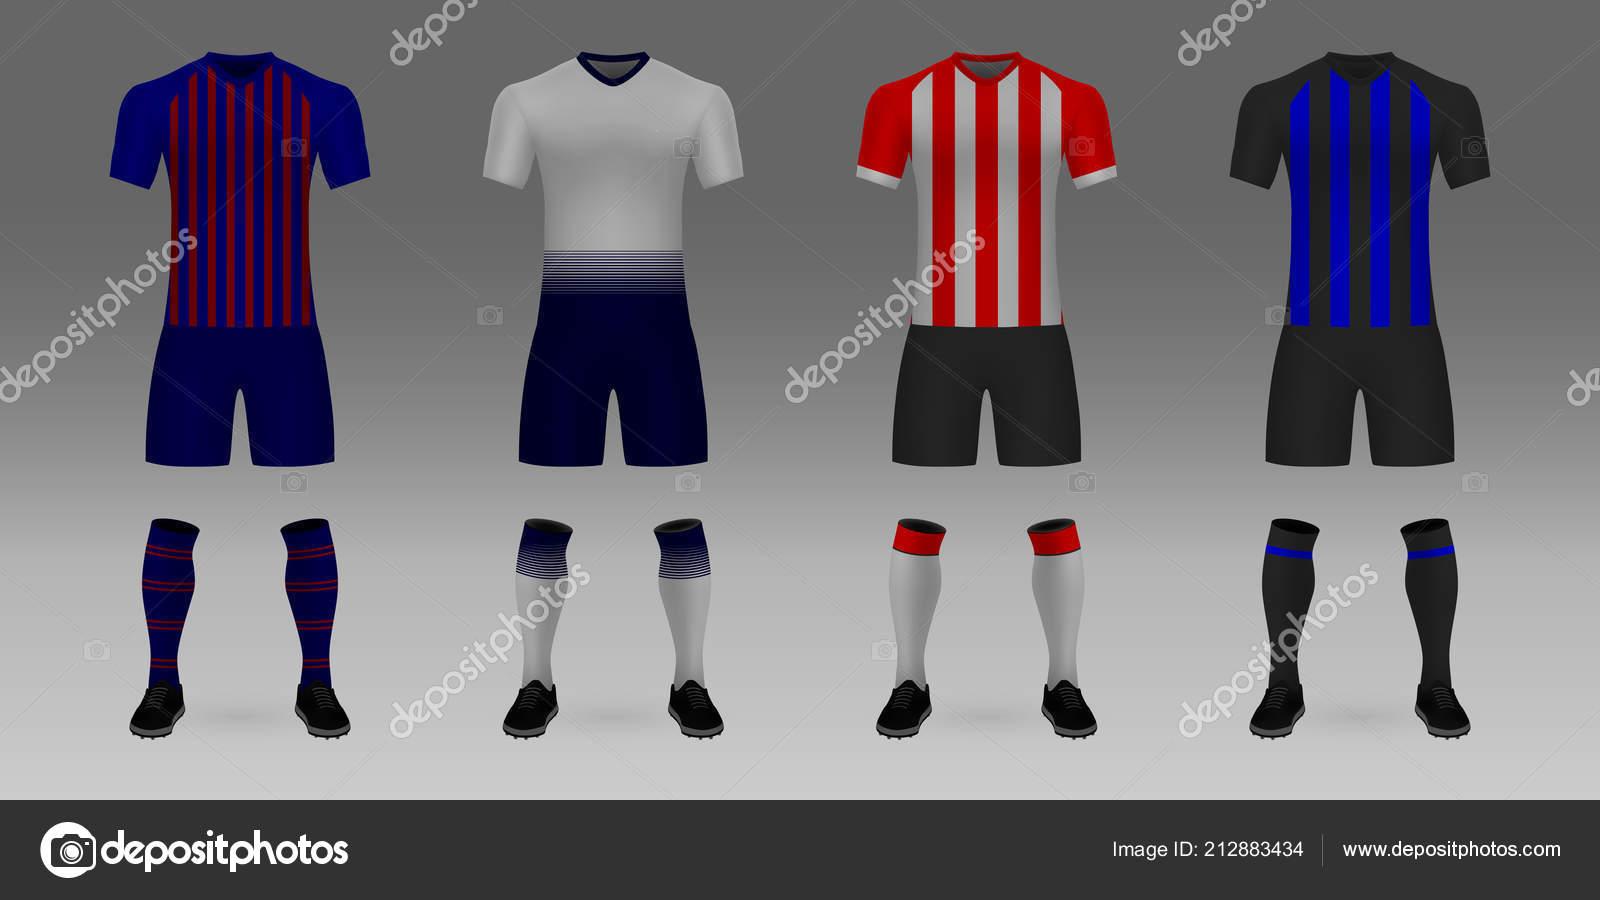 1303036394 Conjunto Realista Modelo Camisa Futebol Barcelona Tottenham Psv Shirt Inter  — Vetores de Stock